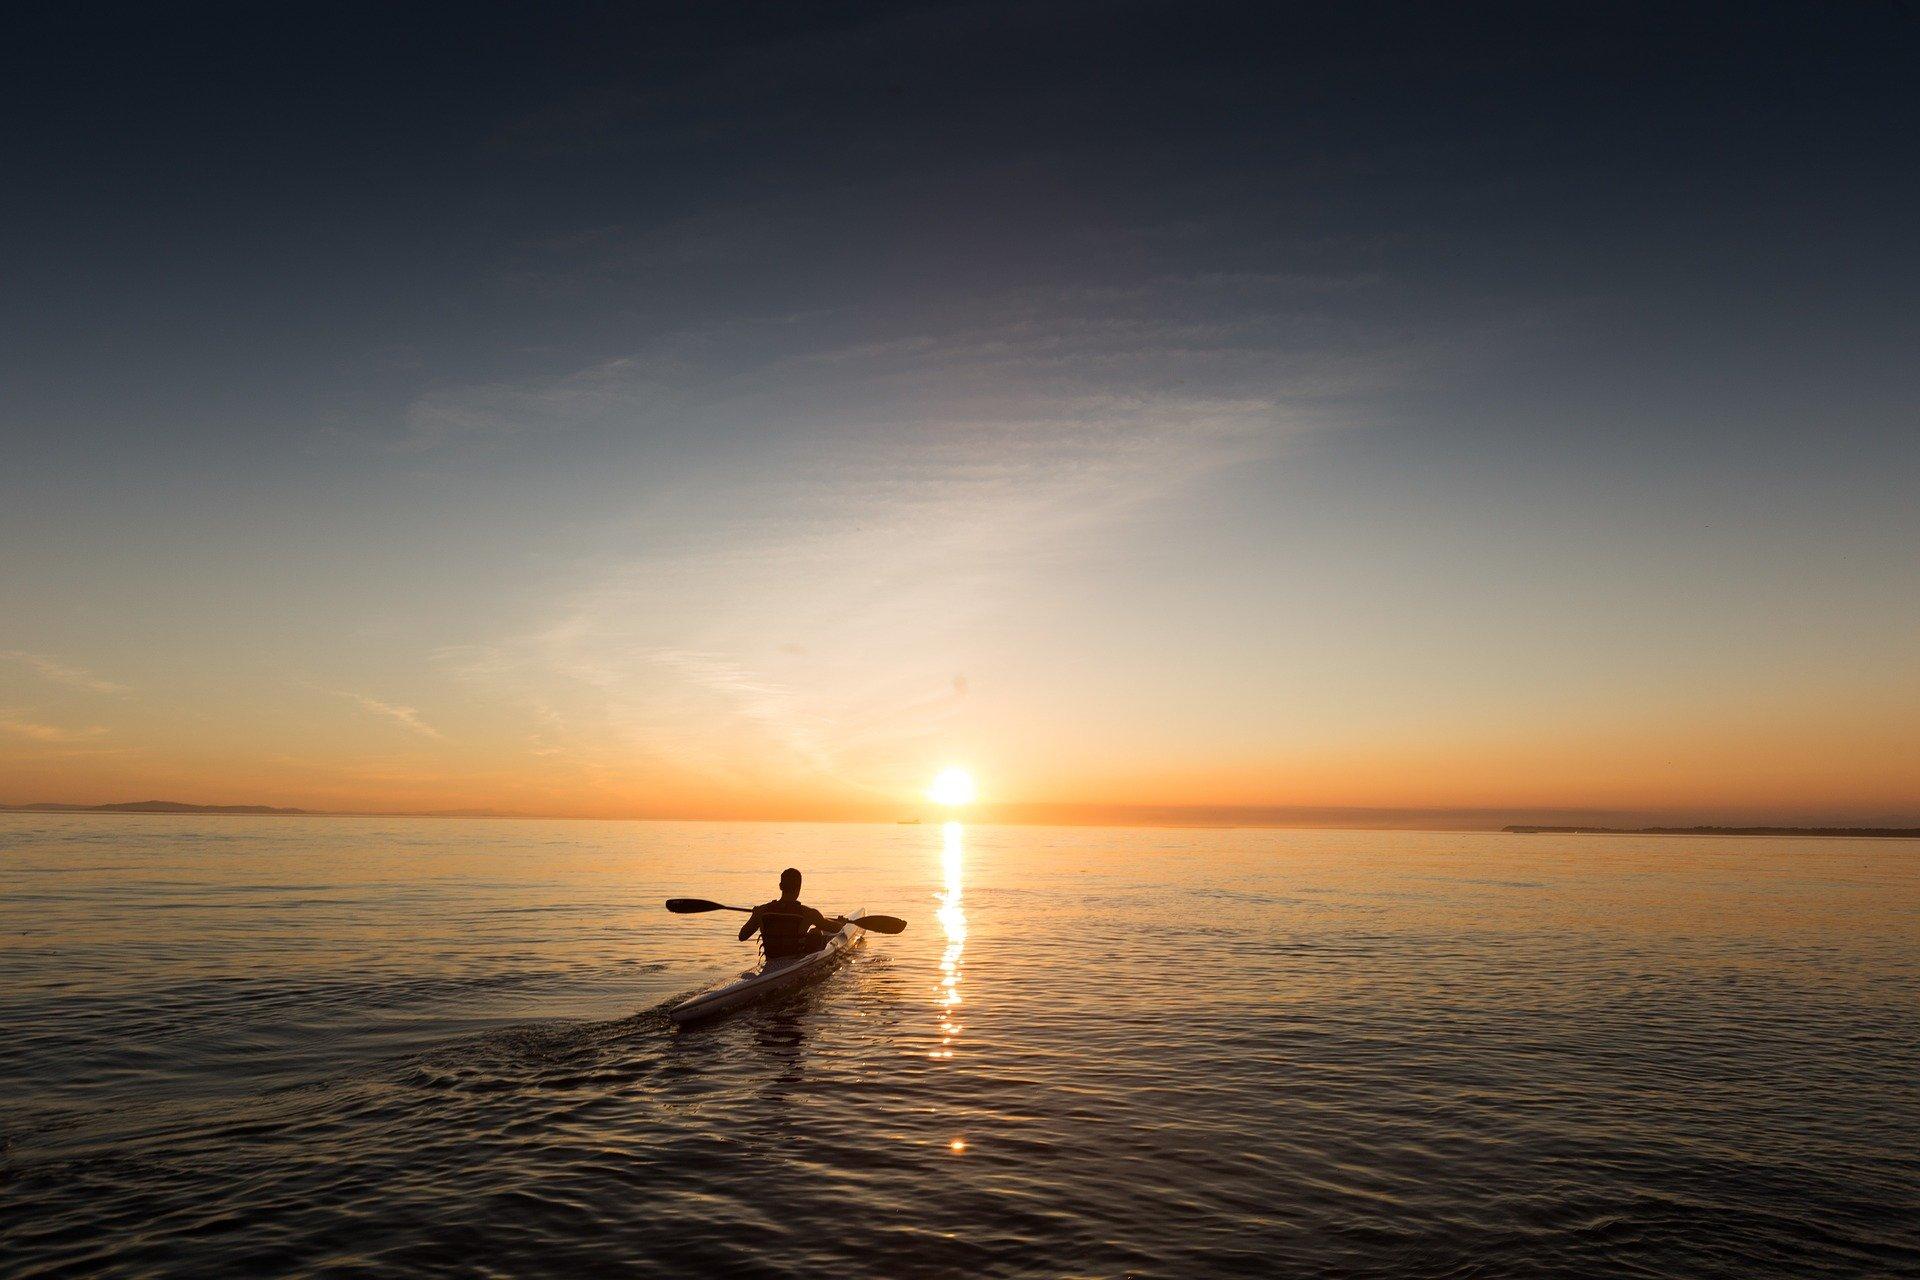 A man kayaks into the sunset.